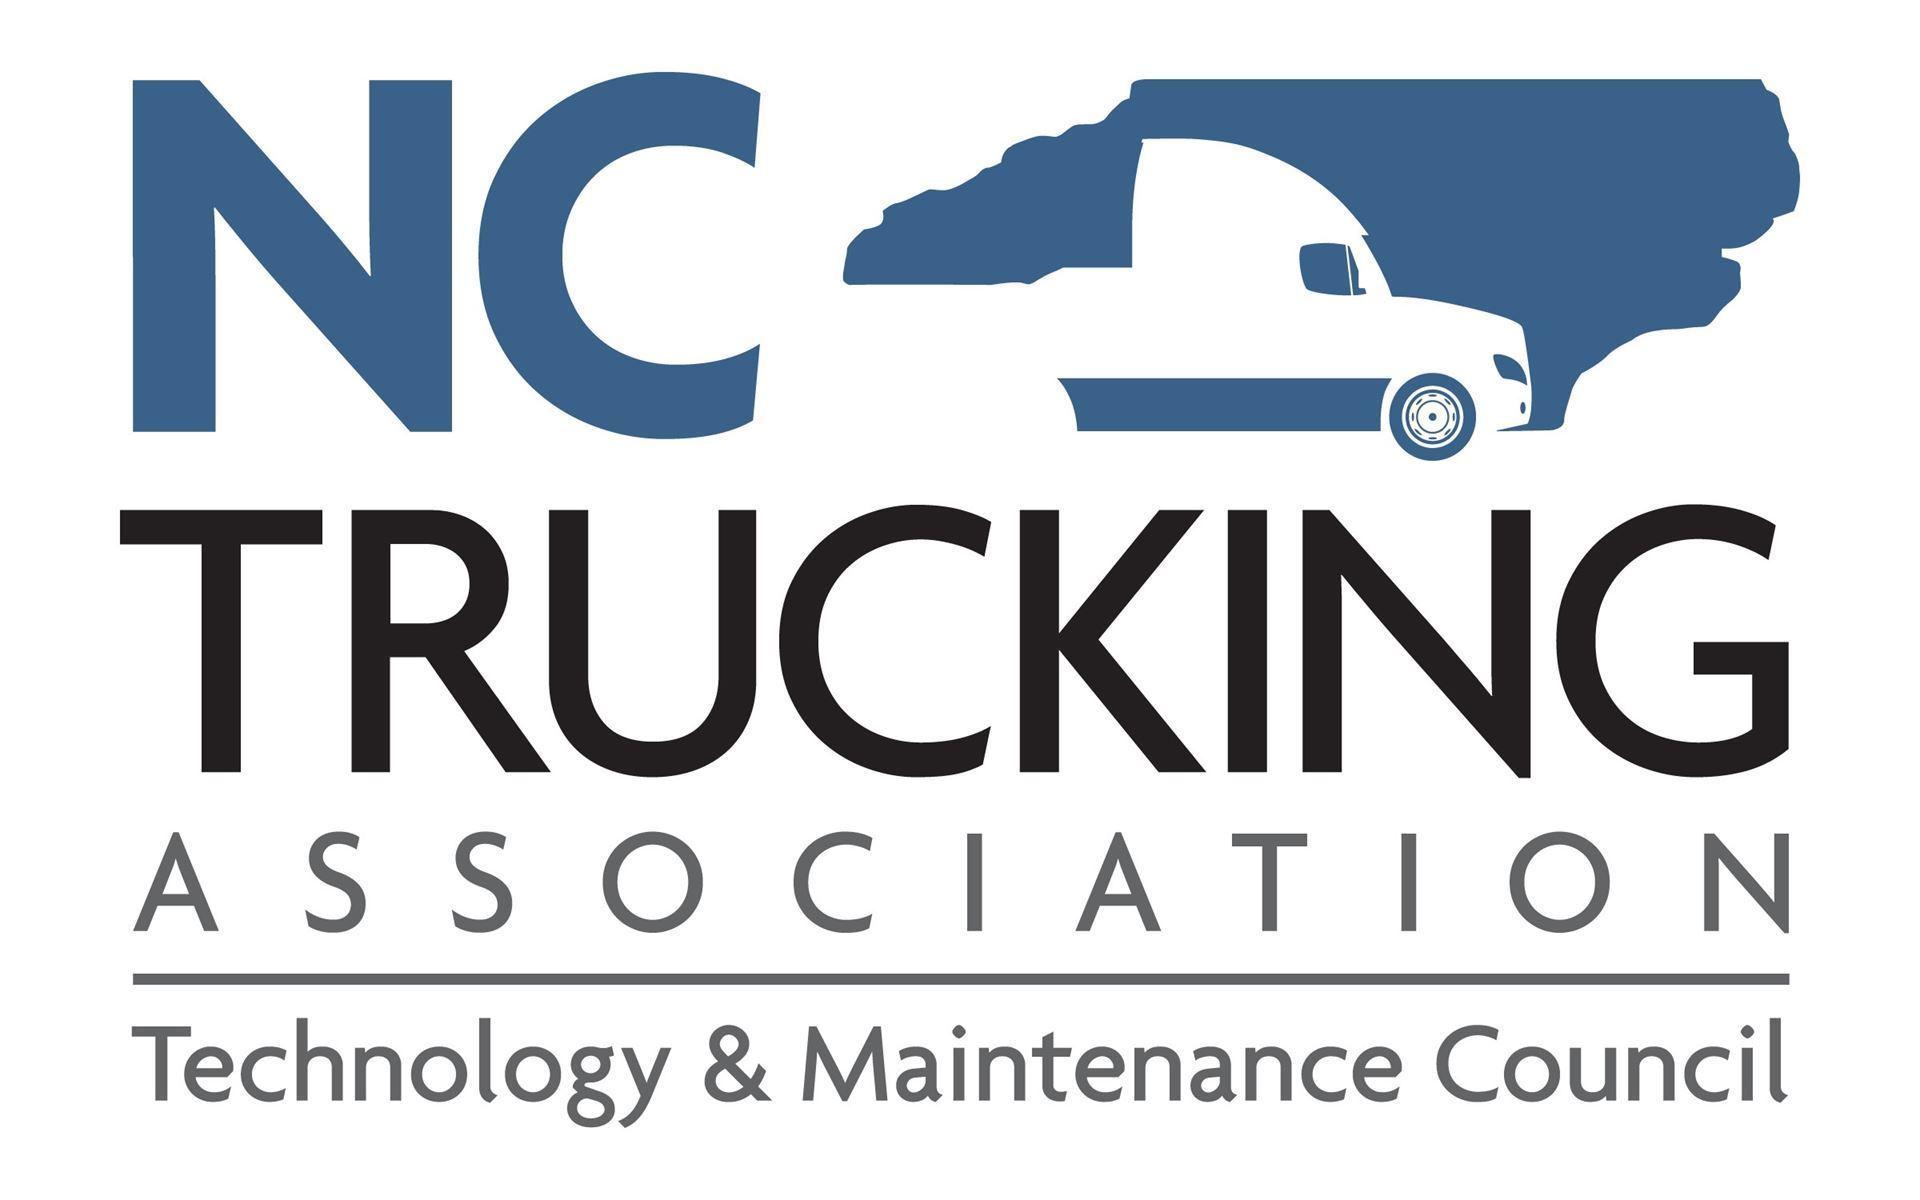 TMC Fleet Manager Meeting: 10/1/20 Hiring and Retaining Techs